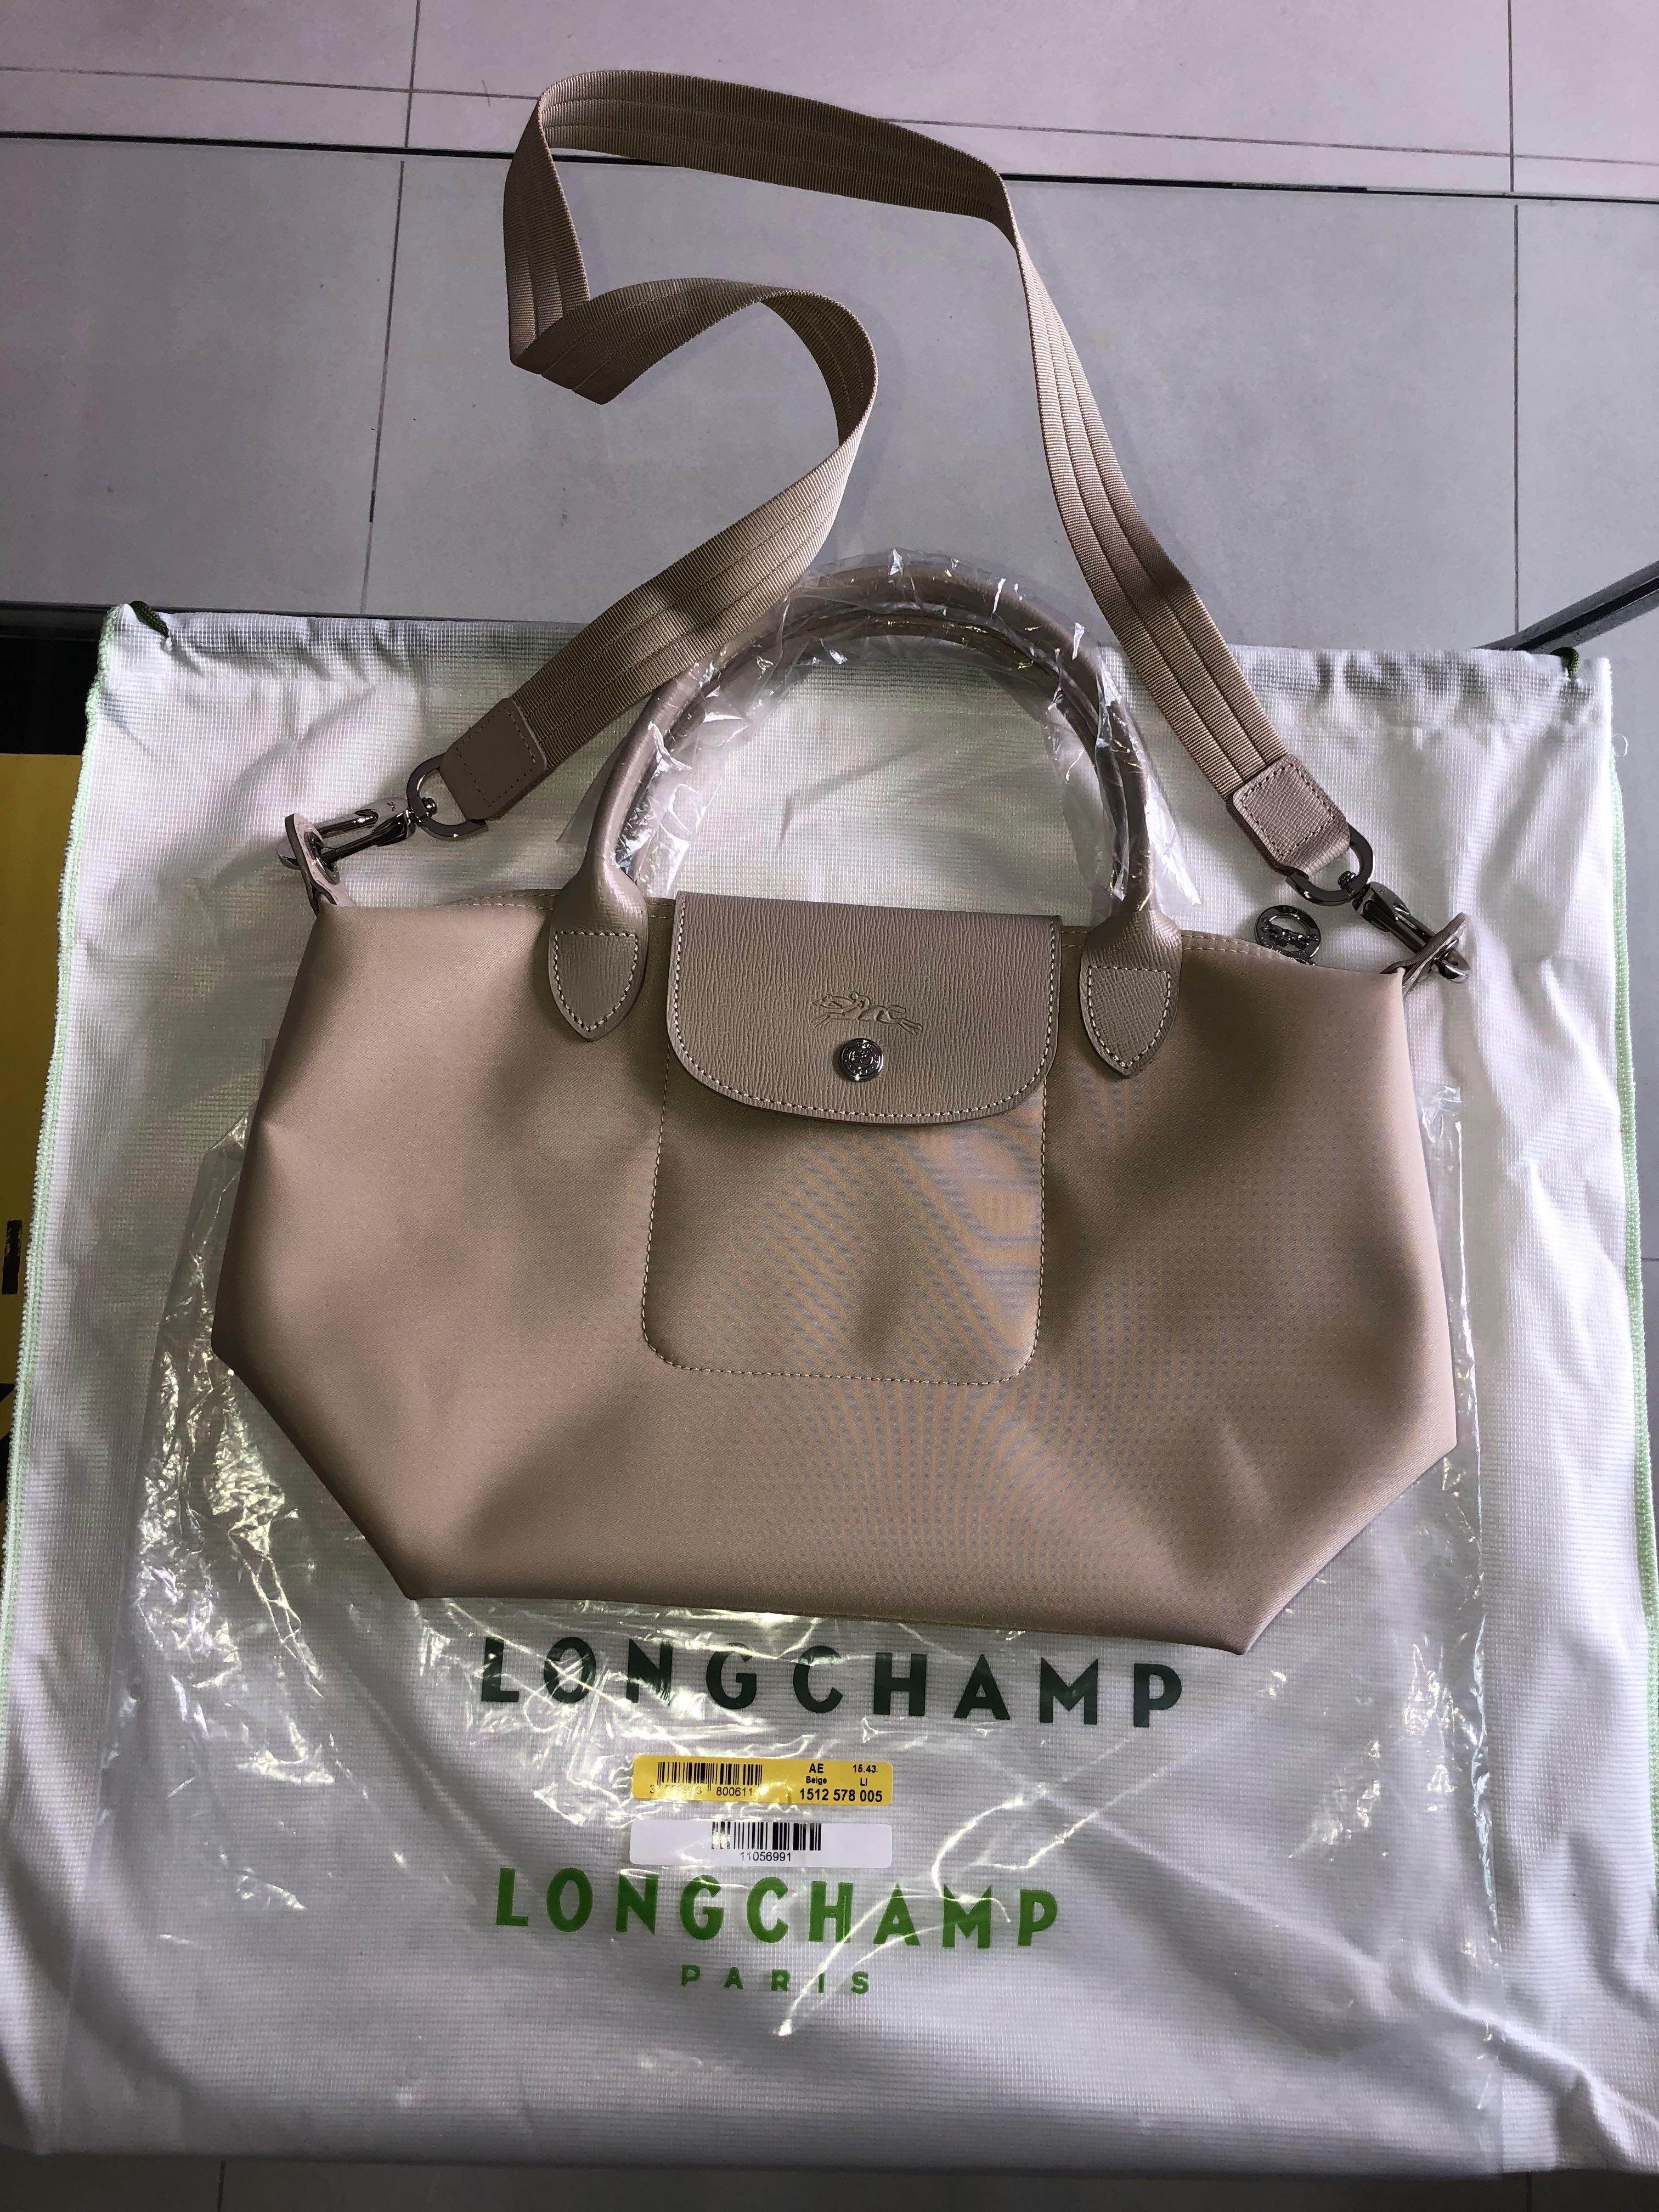 c6f0a8f23489 Longchamp Bag, Women's Fashion, Bags & Wallets, Handbags on Carousell